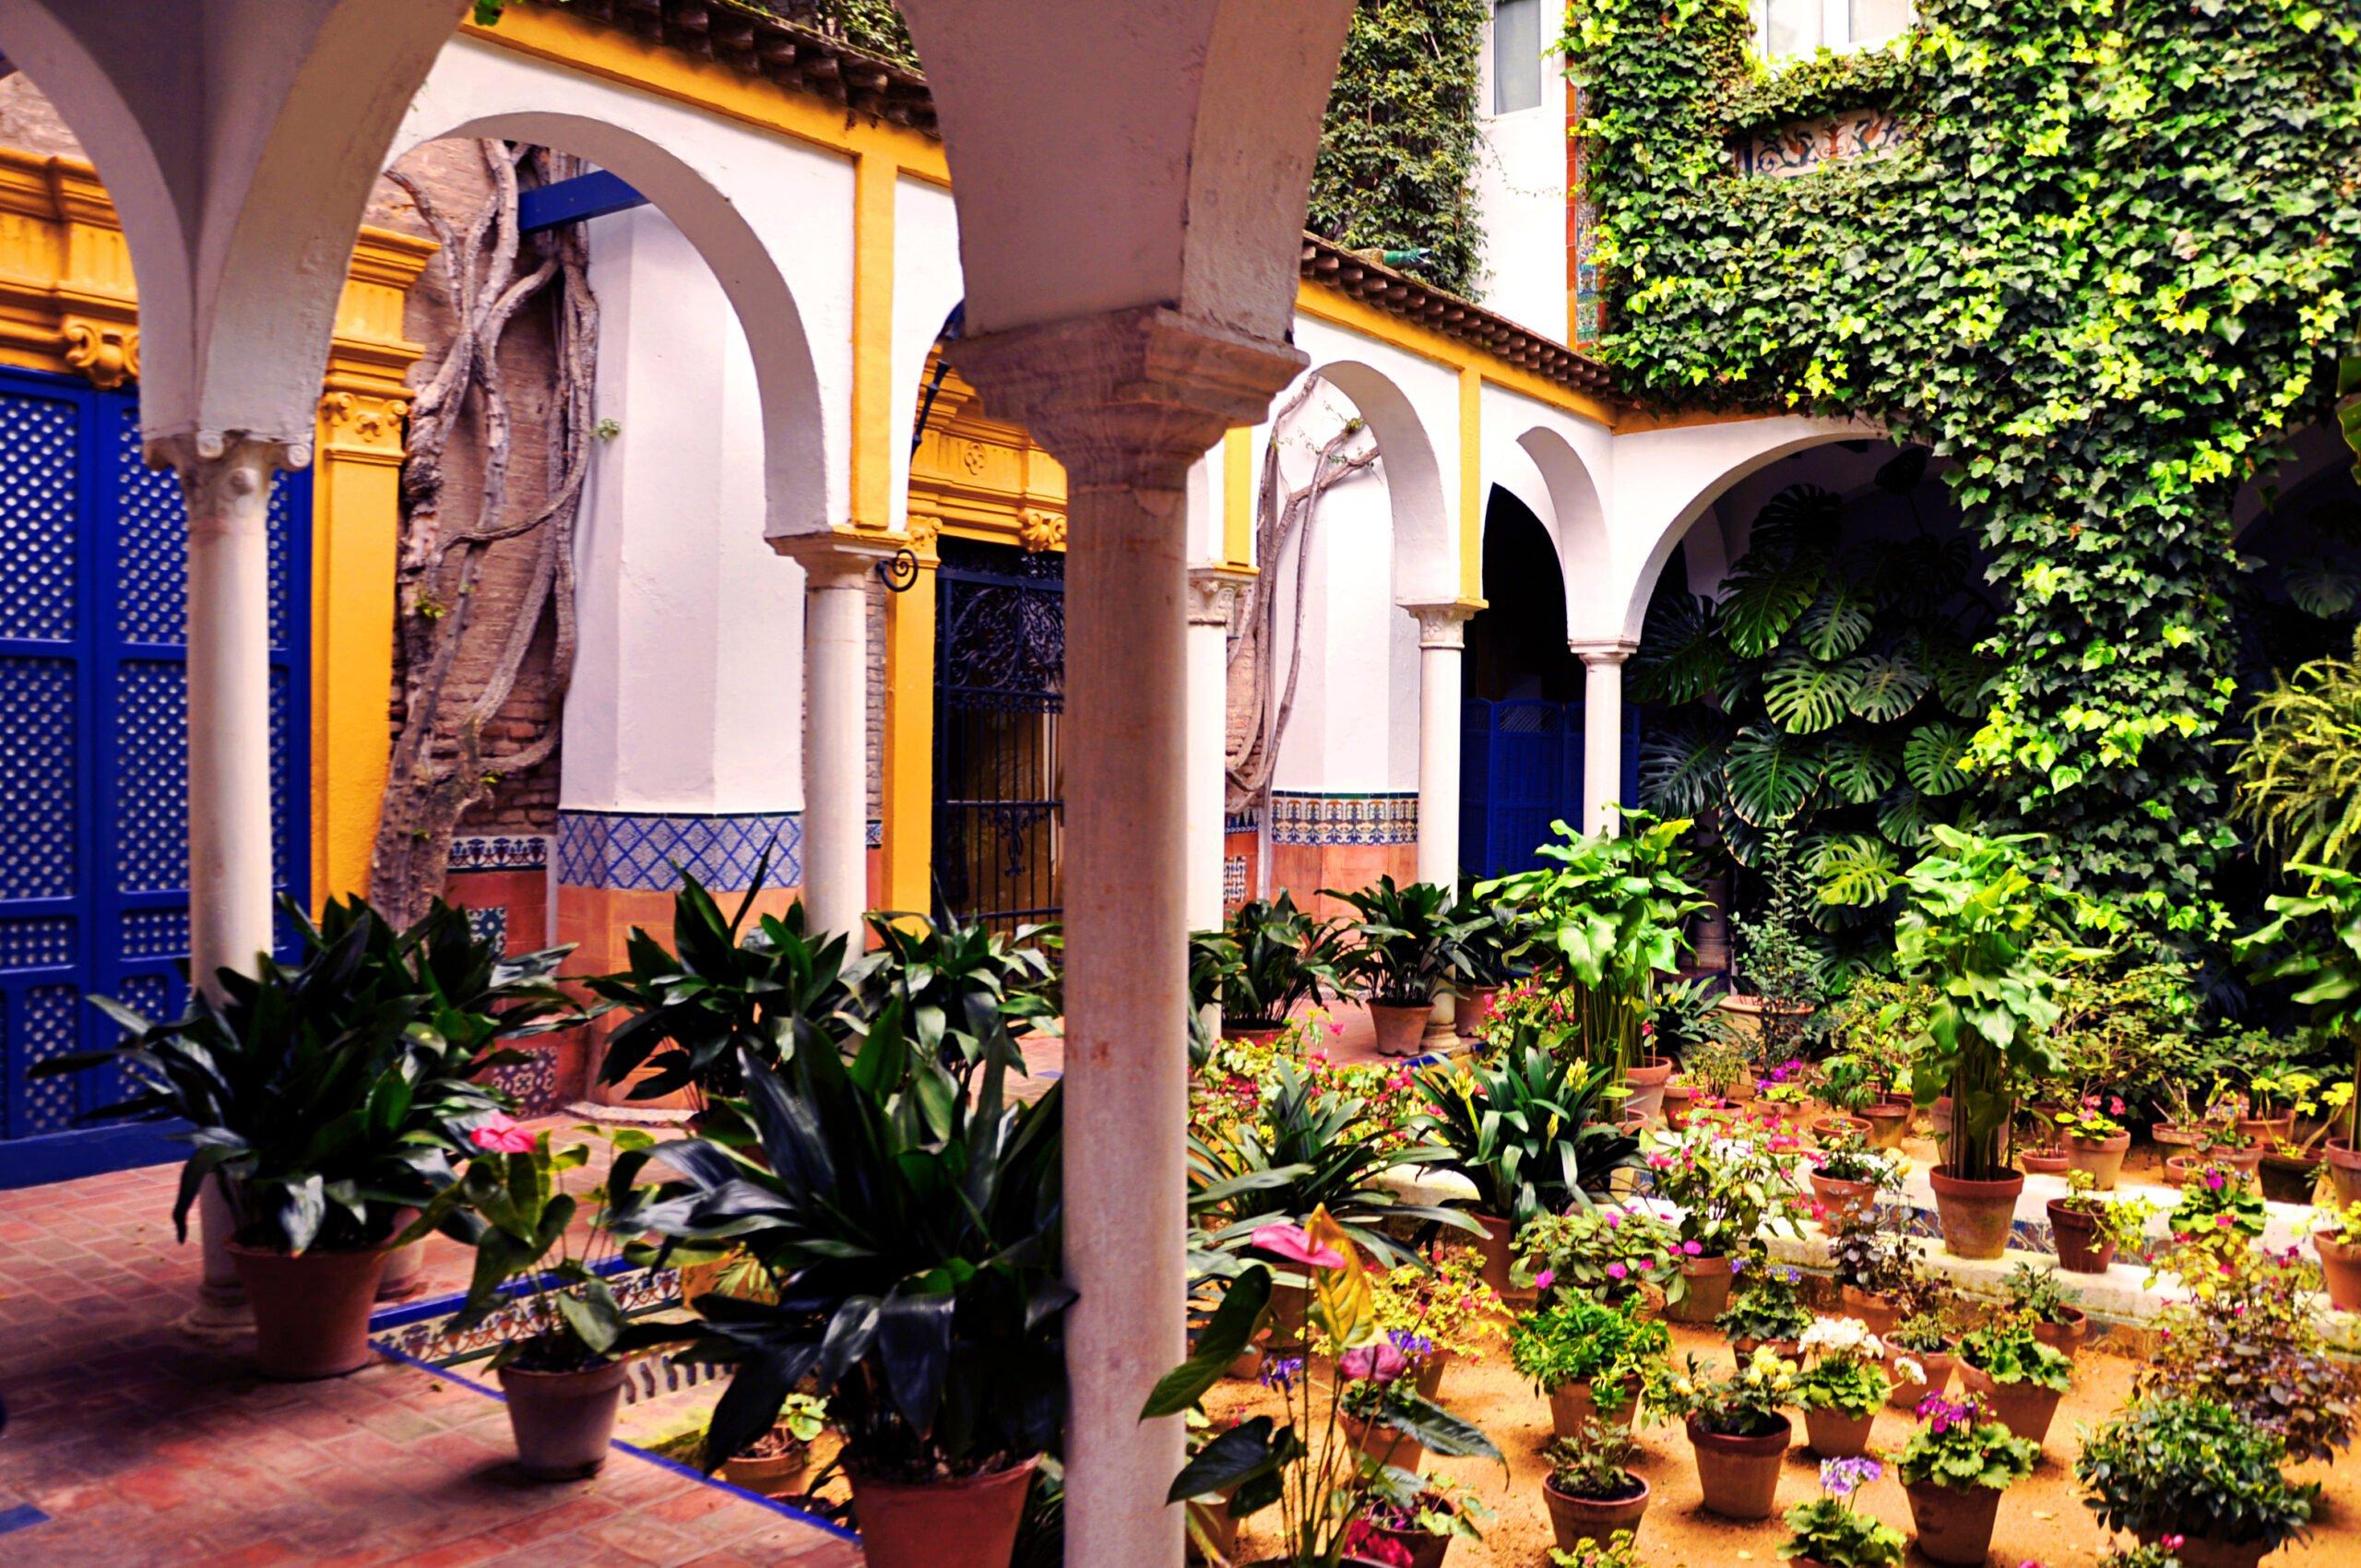 Explore The Beautiful Neighborhood Of Santa Cruz On The Insider Seville City Tour